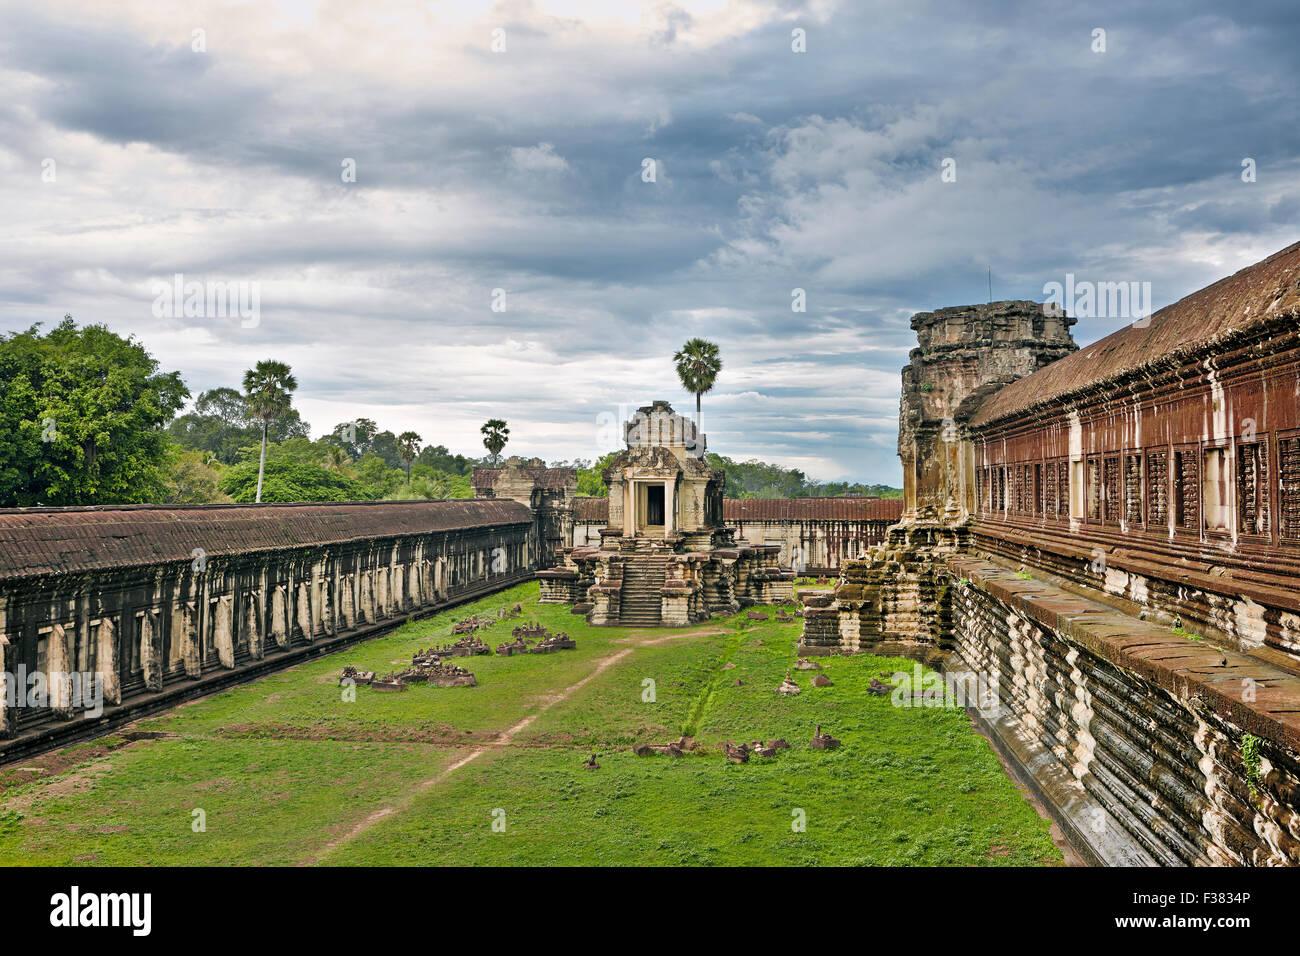 Angkor Wat Tempel. Angkor archäologischer Park, Siem Reap Provinz, Kambodscha. Stockbild